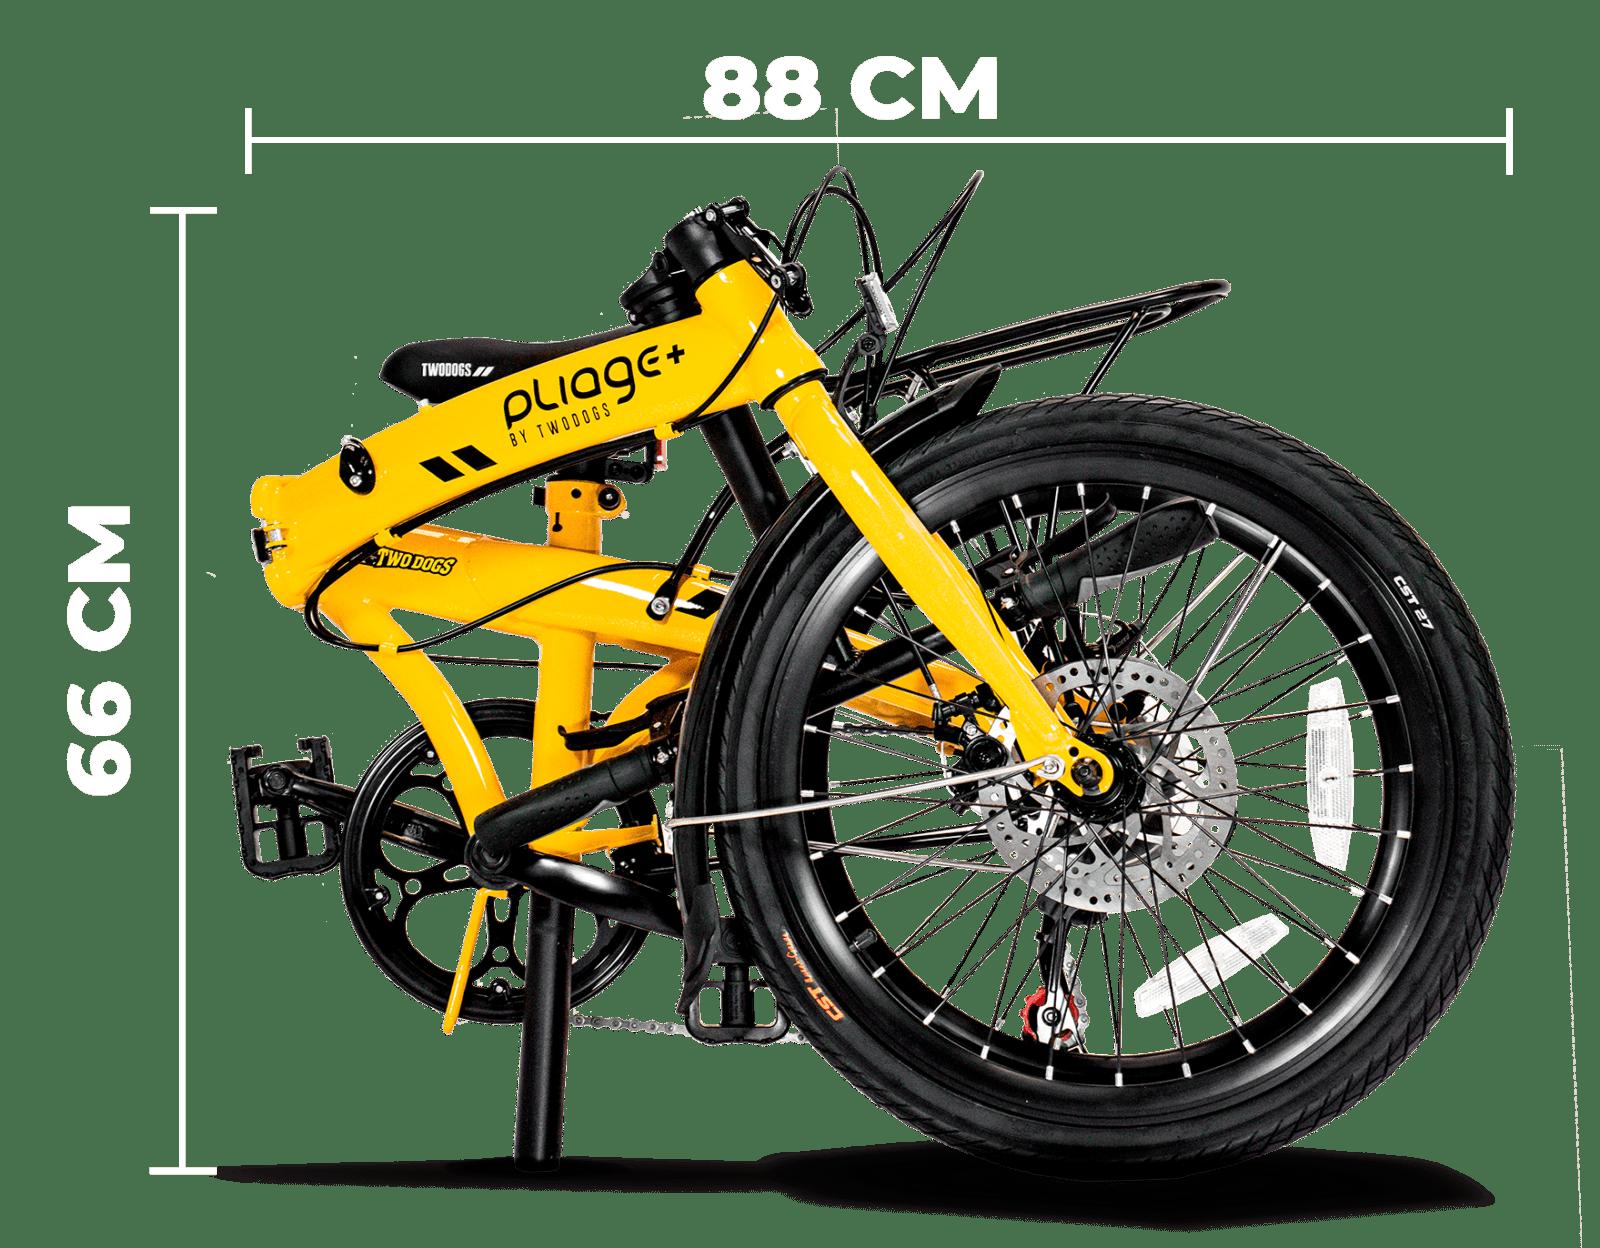 bicicleta dobravel plaige Plus Two Dogs amarela dobrada